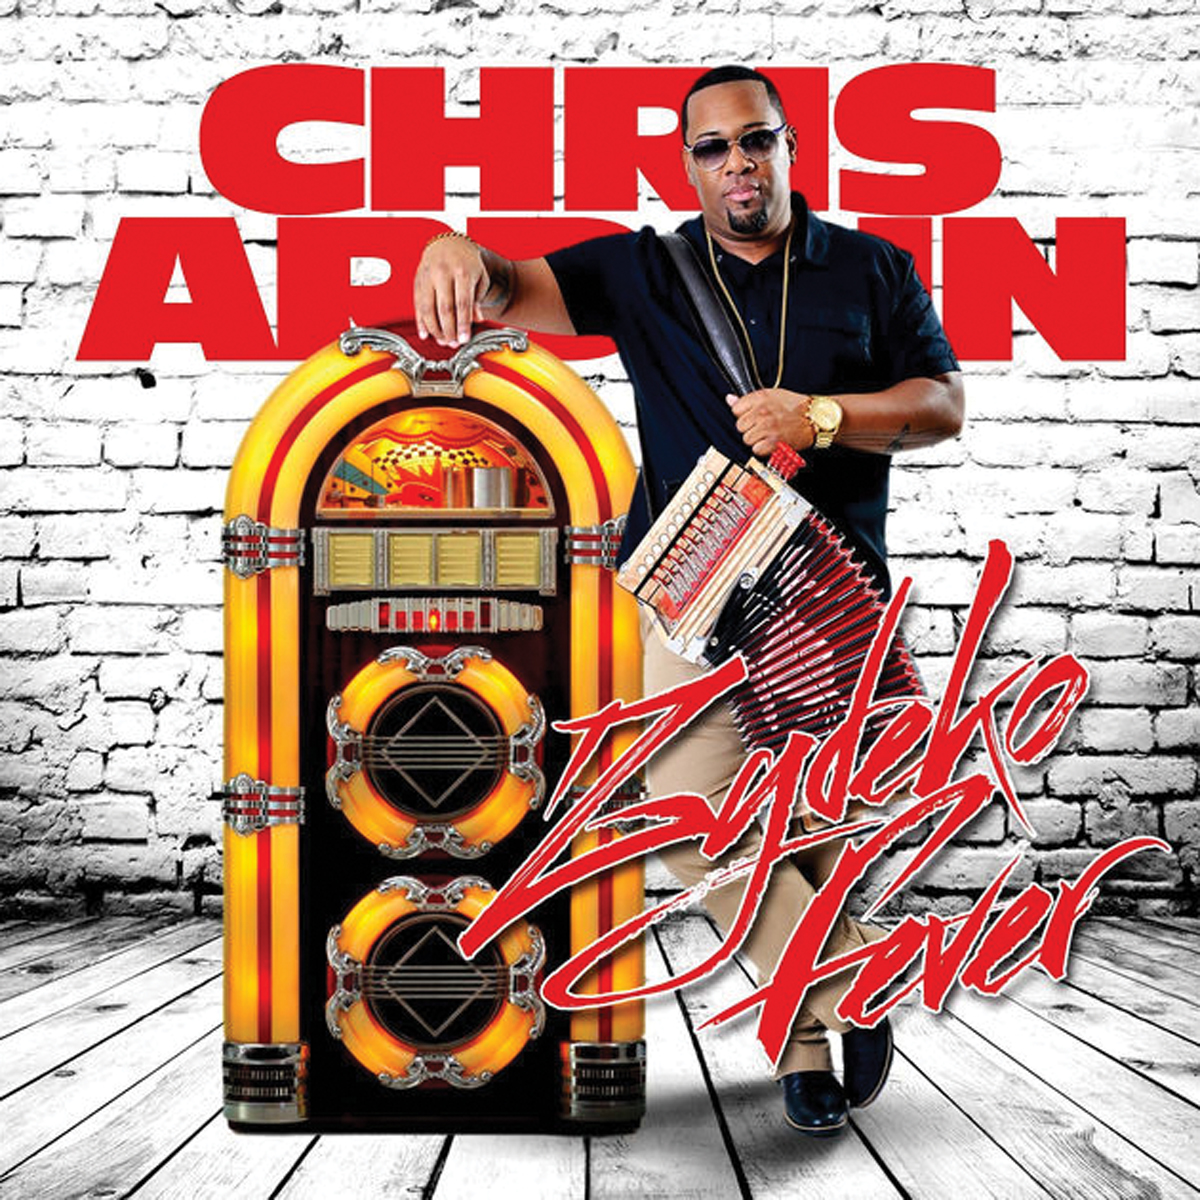 Chris Ardoin & Nustep Zydeko, Zydeko Fever (Album Review)